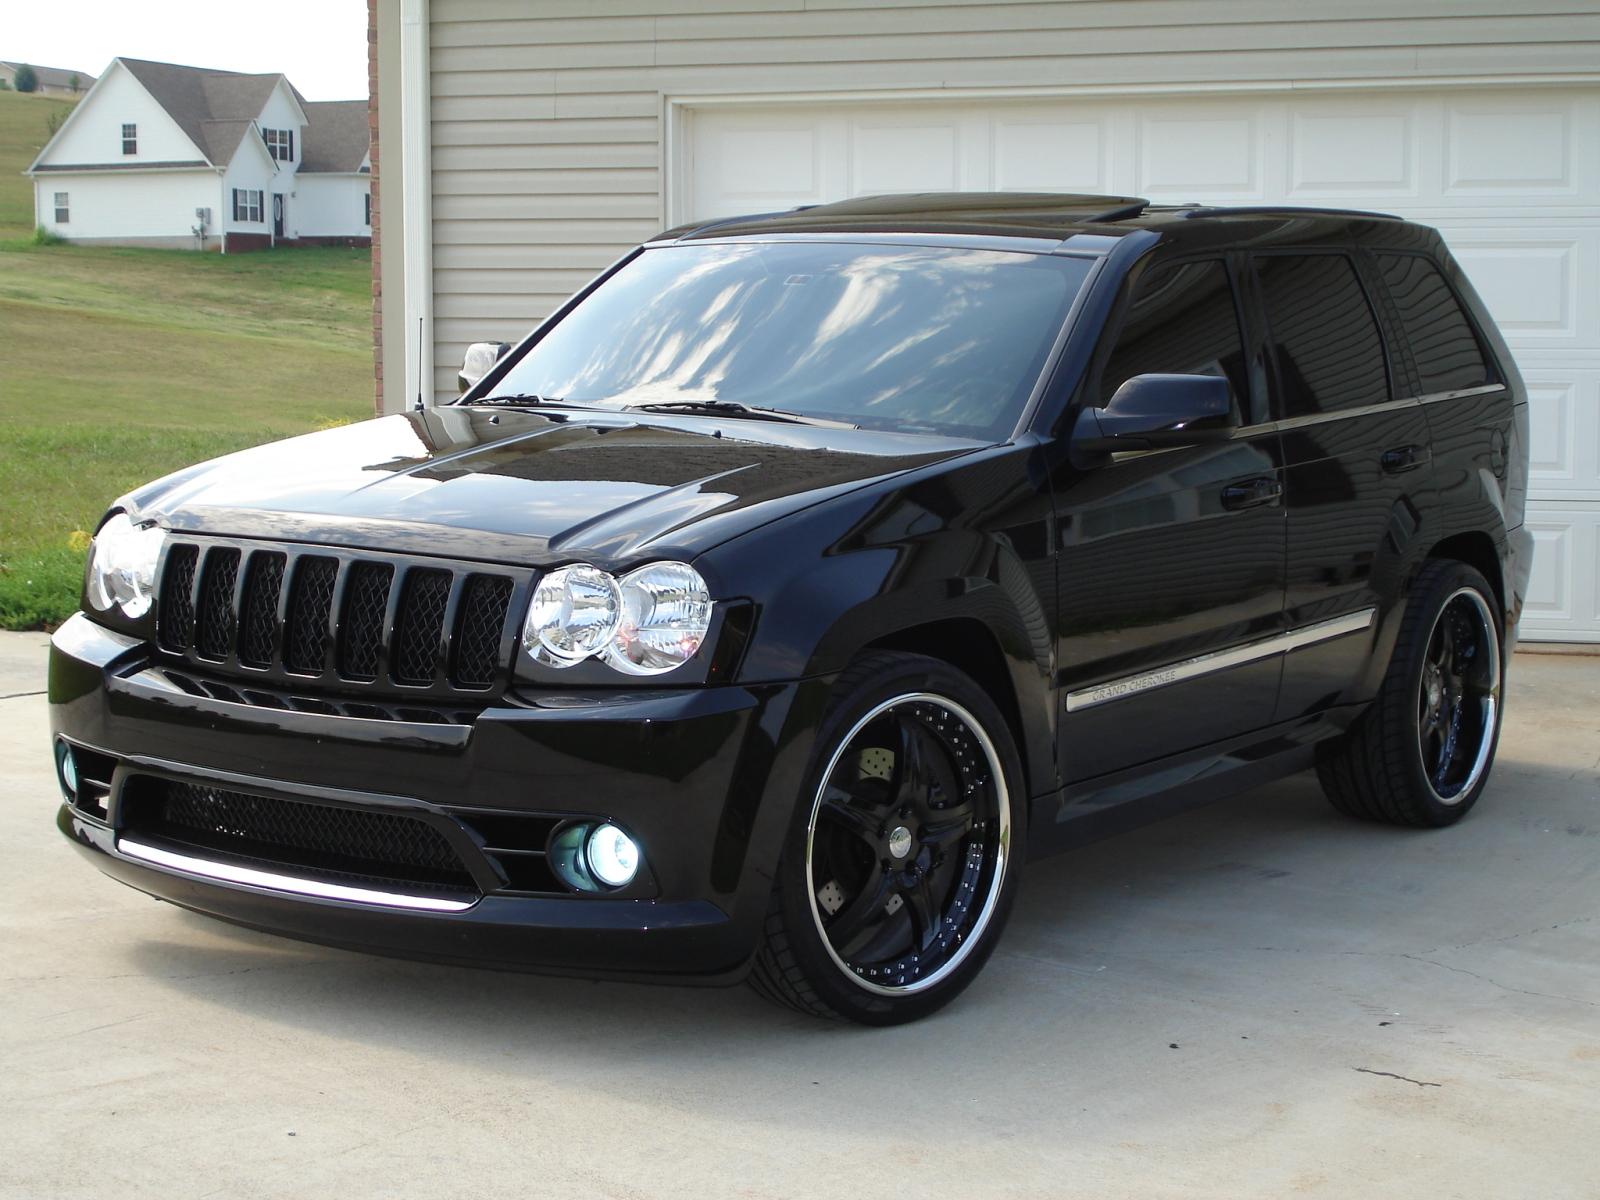 2006 Jeep Grand Cherokee Vins Configurations Msrp Specs Autodetective